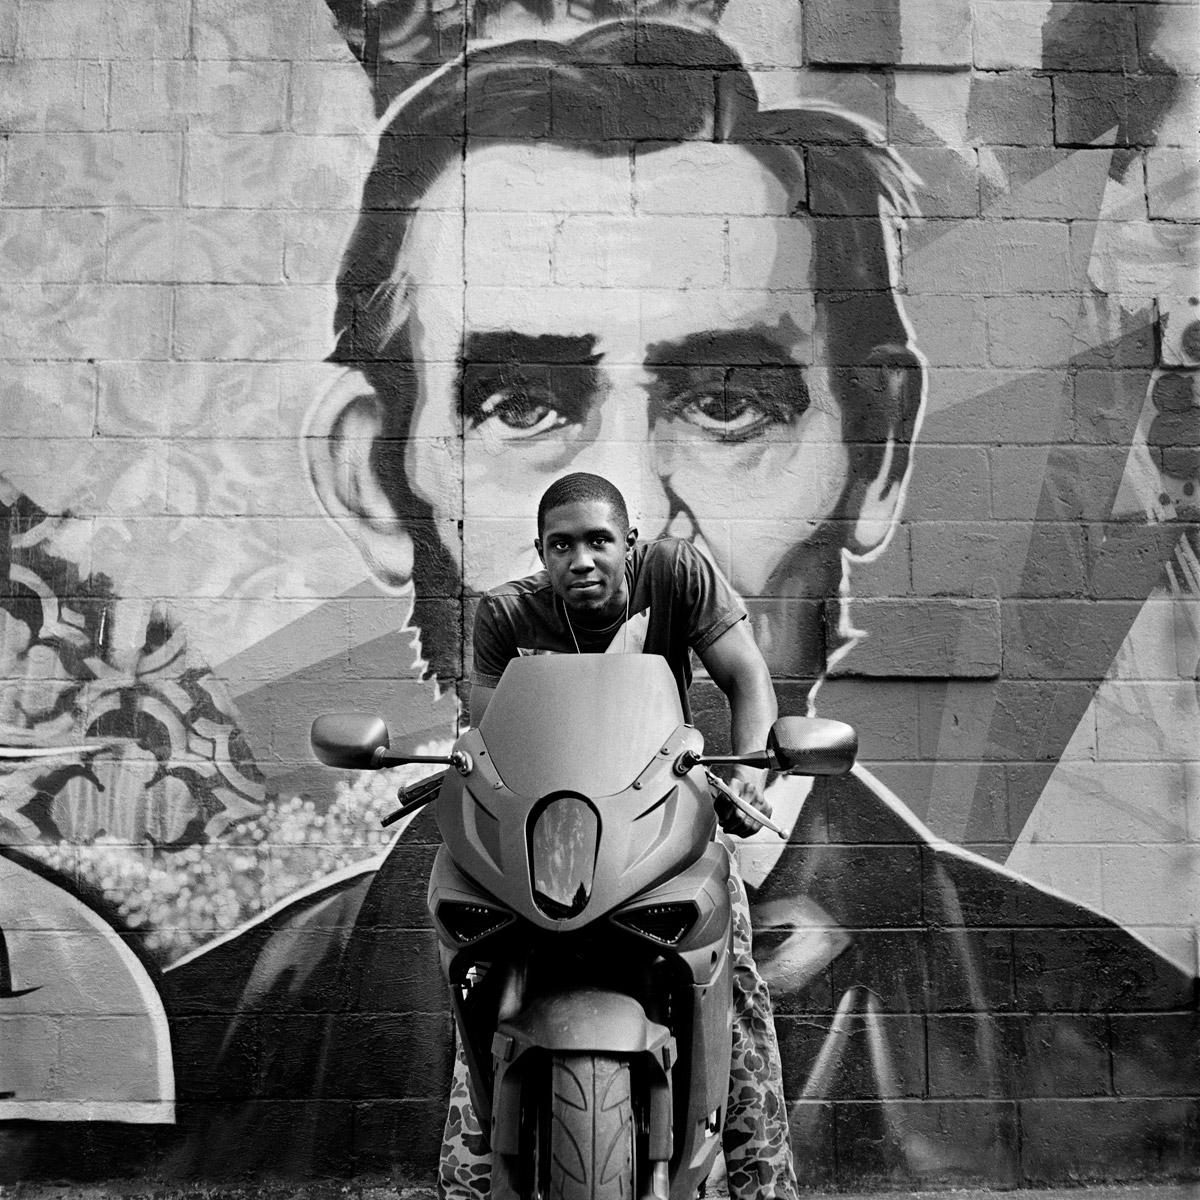 Prospect Graham of The Katz motorcycle club, Brooklyn, 2014.